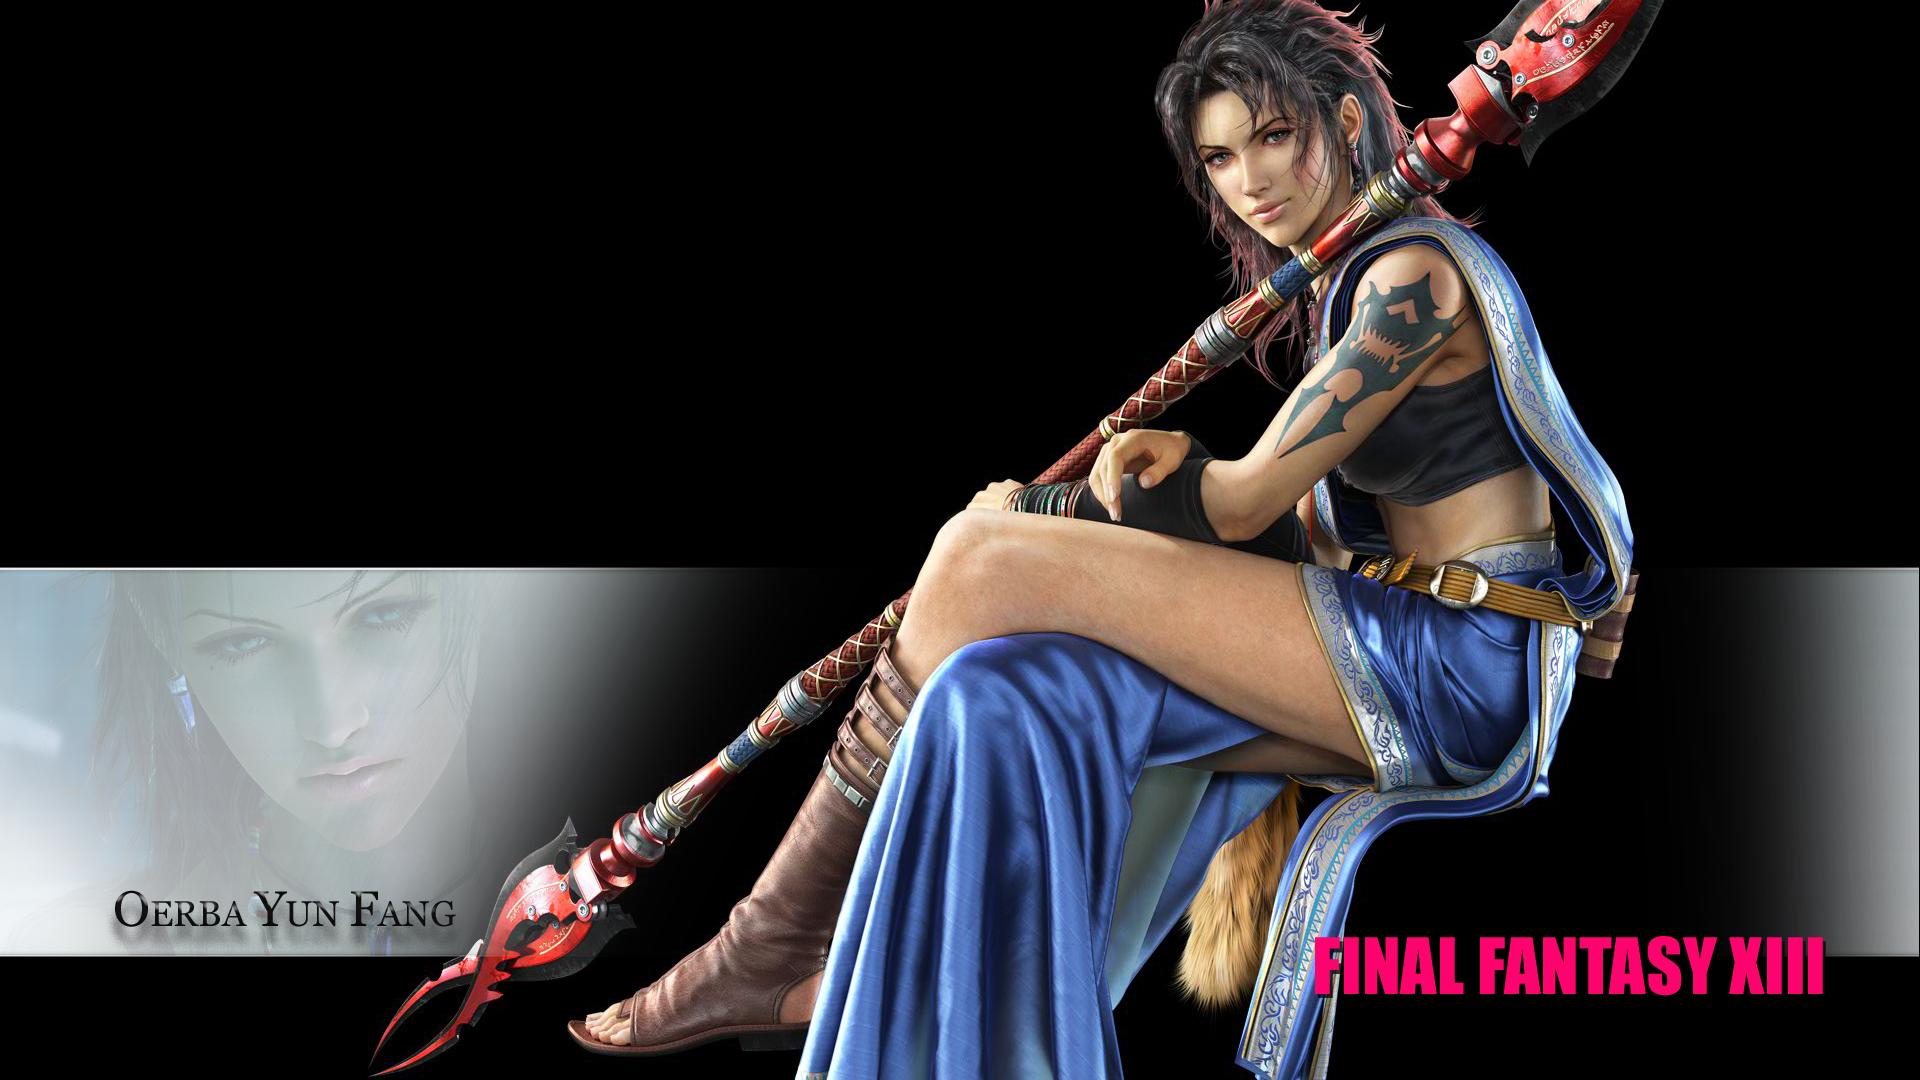 Final Fantasy Fanta Ps3 Ps3 wallpapers HD   124034 1920x1080